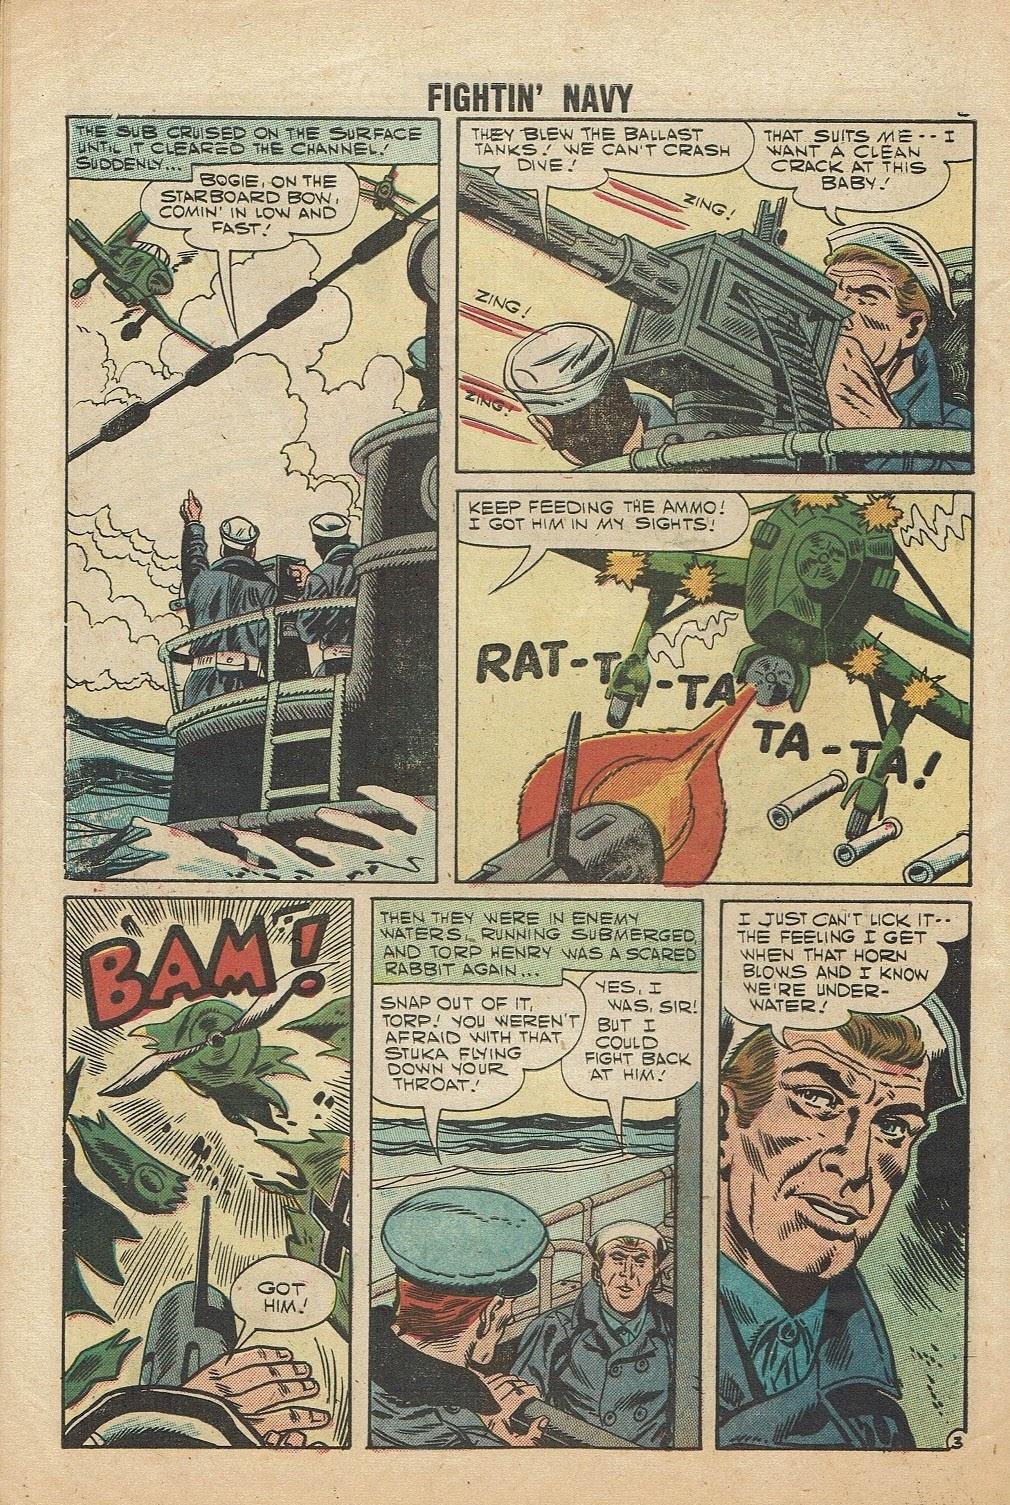 Read online Fightin' Navy comic -  Issue #81 - 30